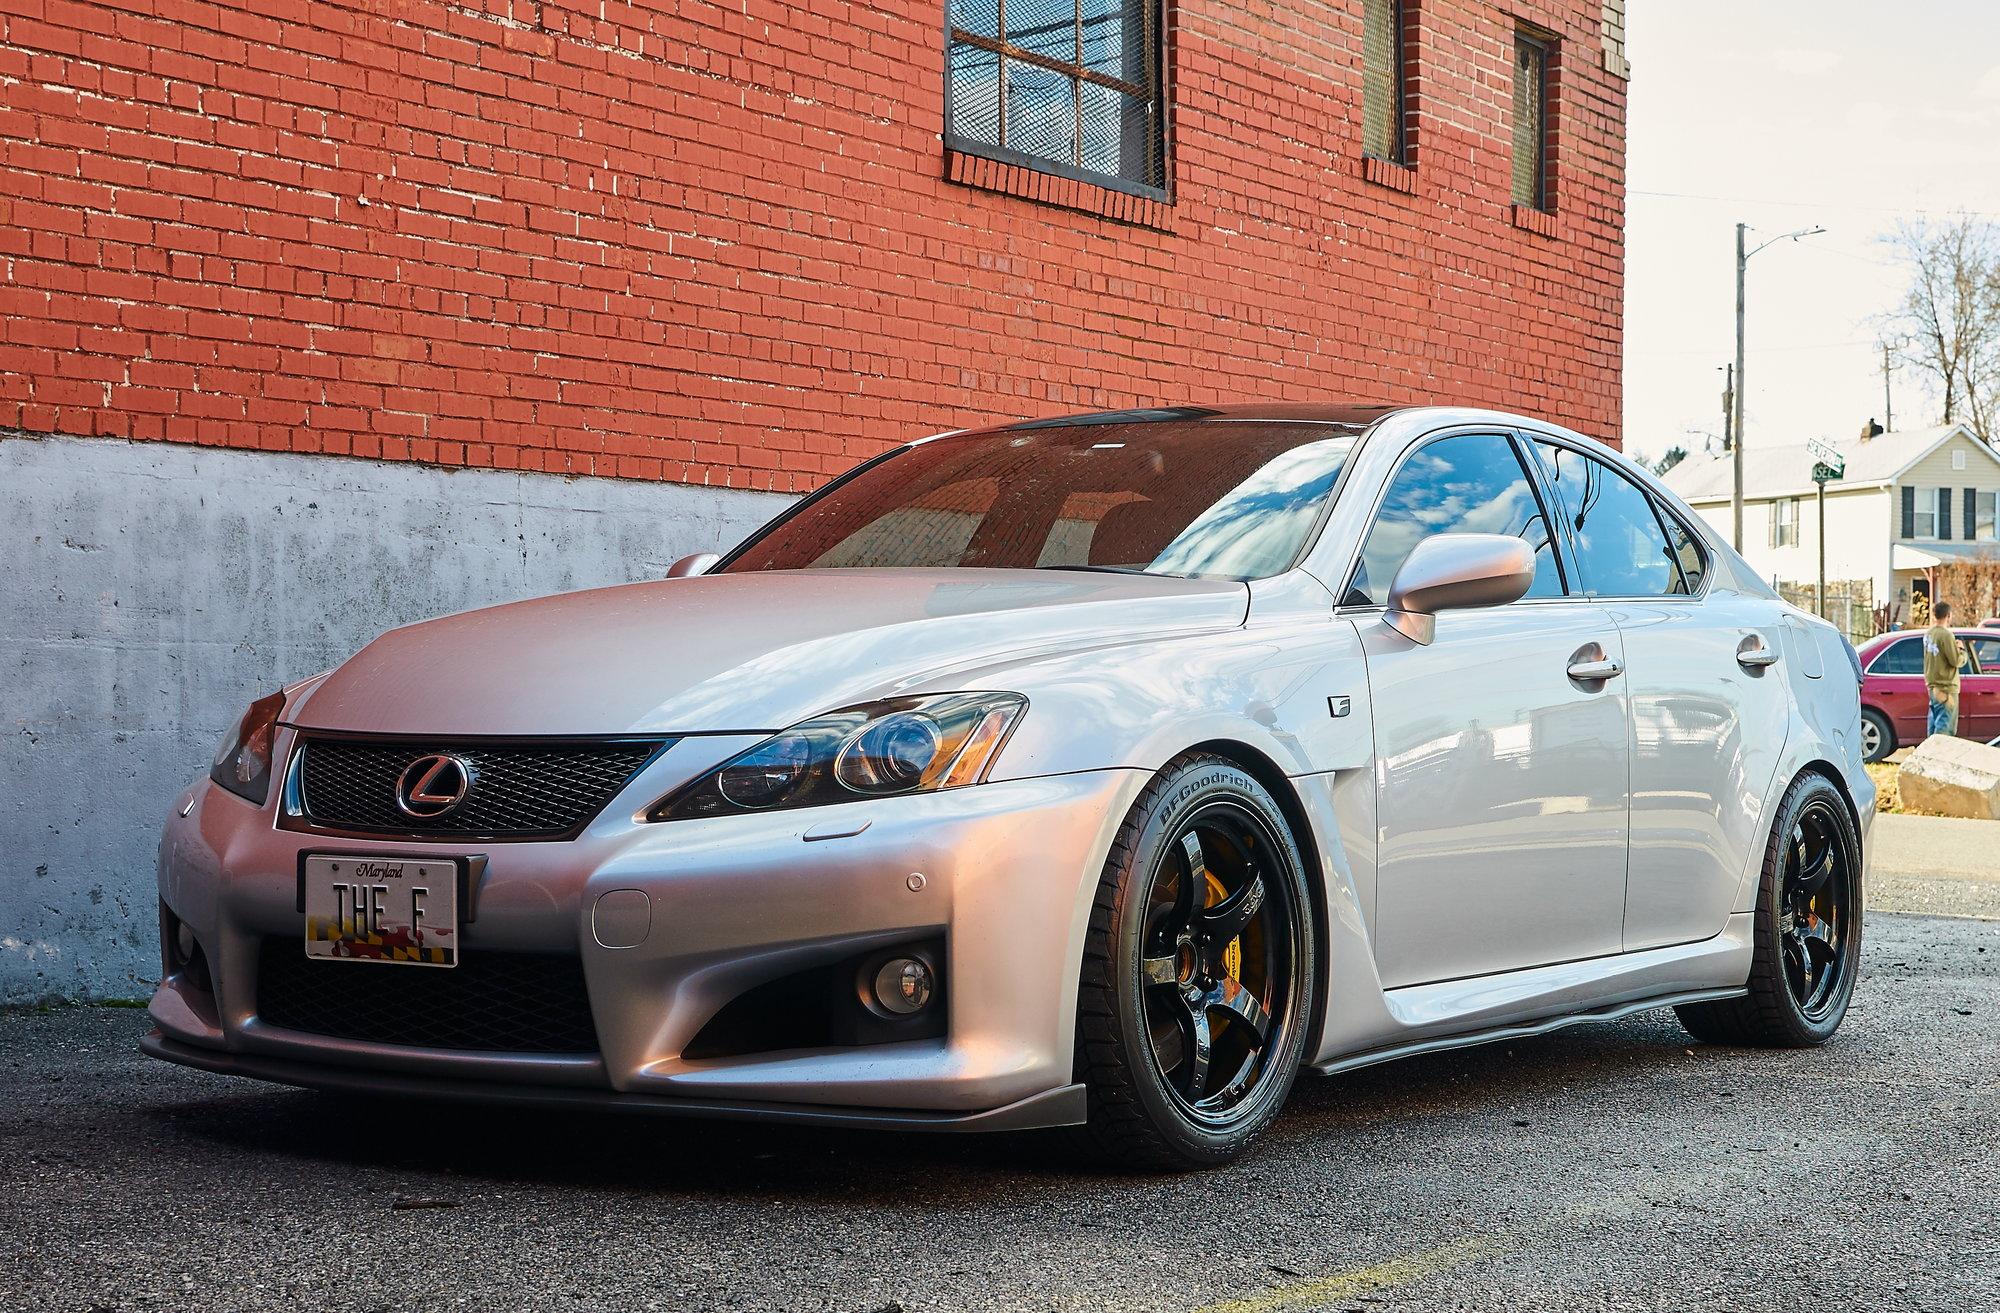 Lexus Of Annapolis >> New summer/track wheel set-up - Page 2 - ClubLexus - Lexus ...